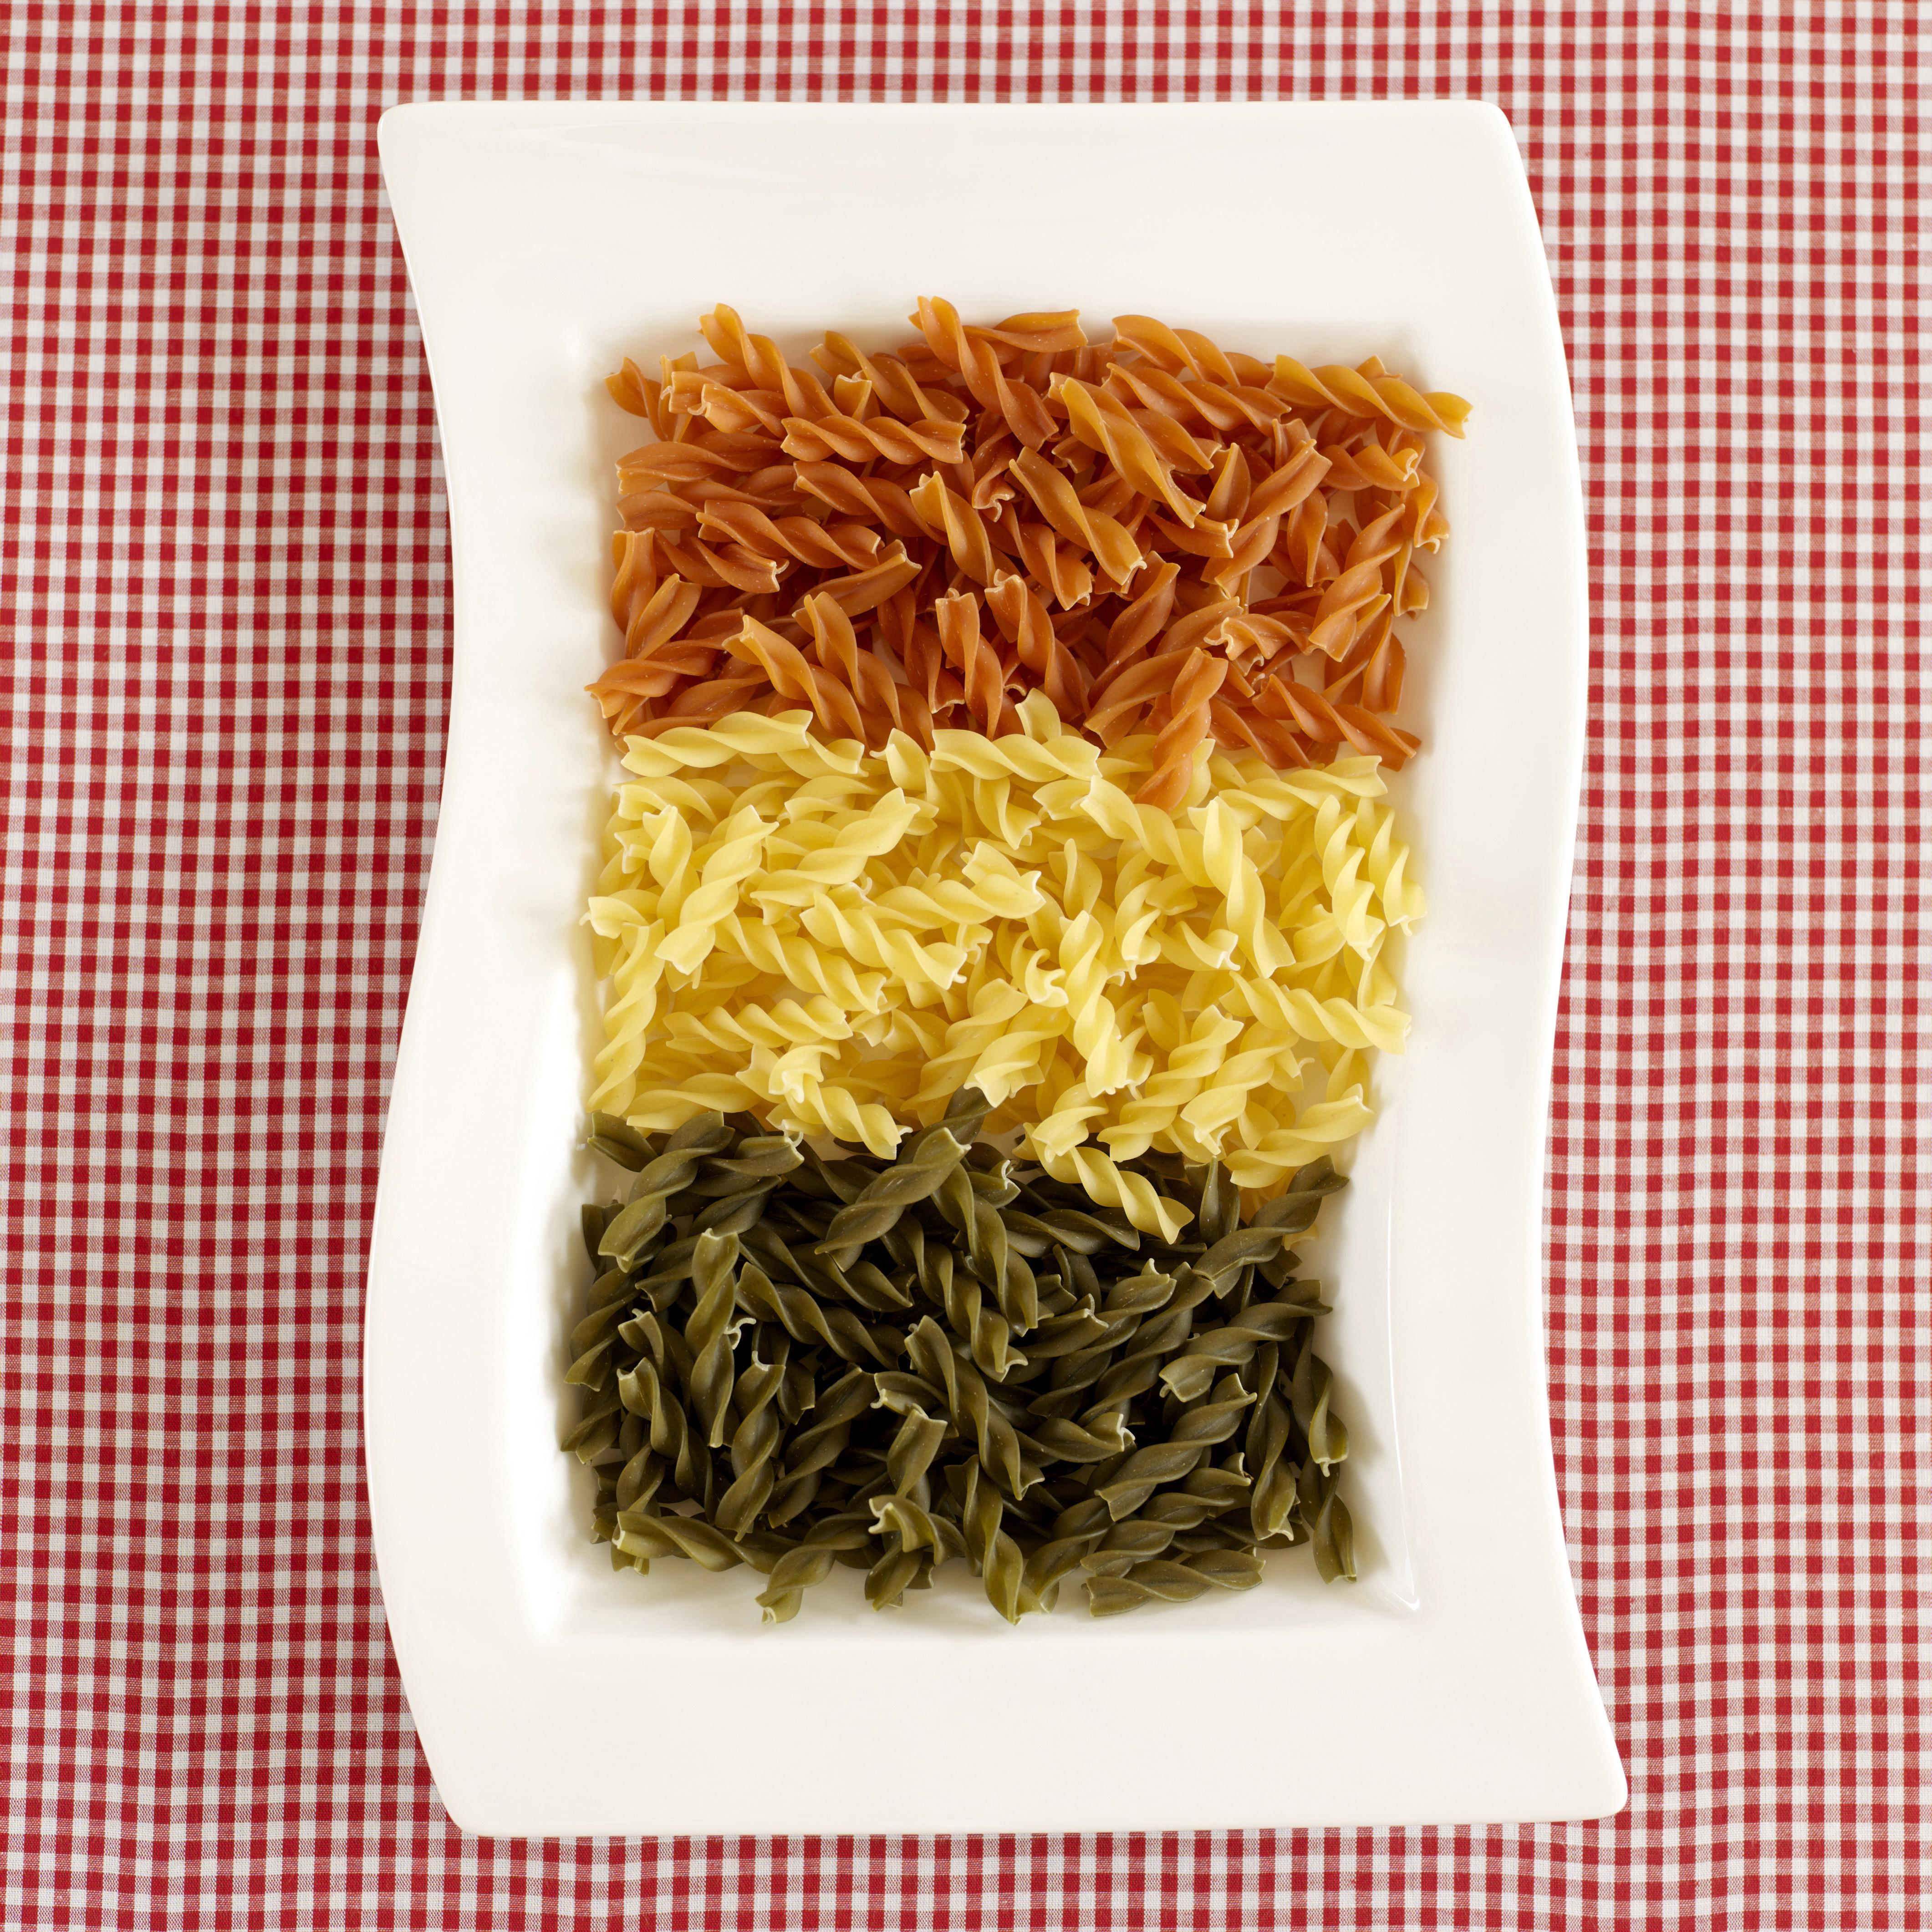 BigYellowBag Black Garden Soil Pasta Salad